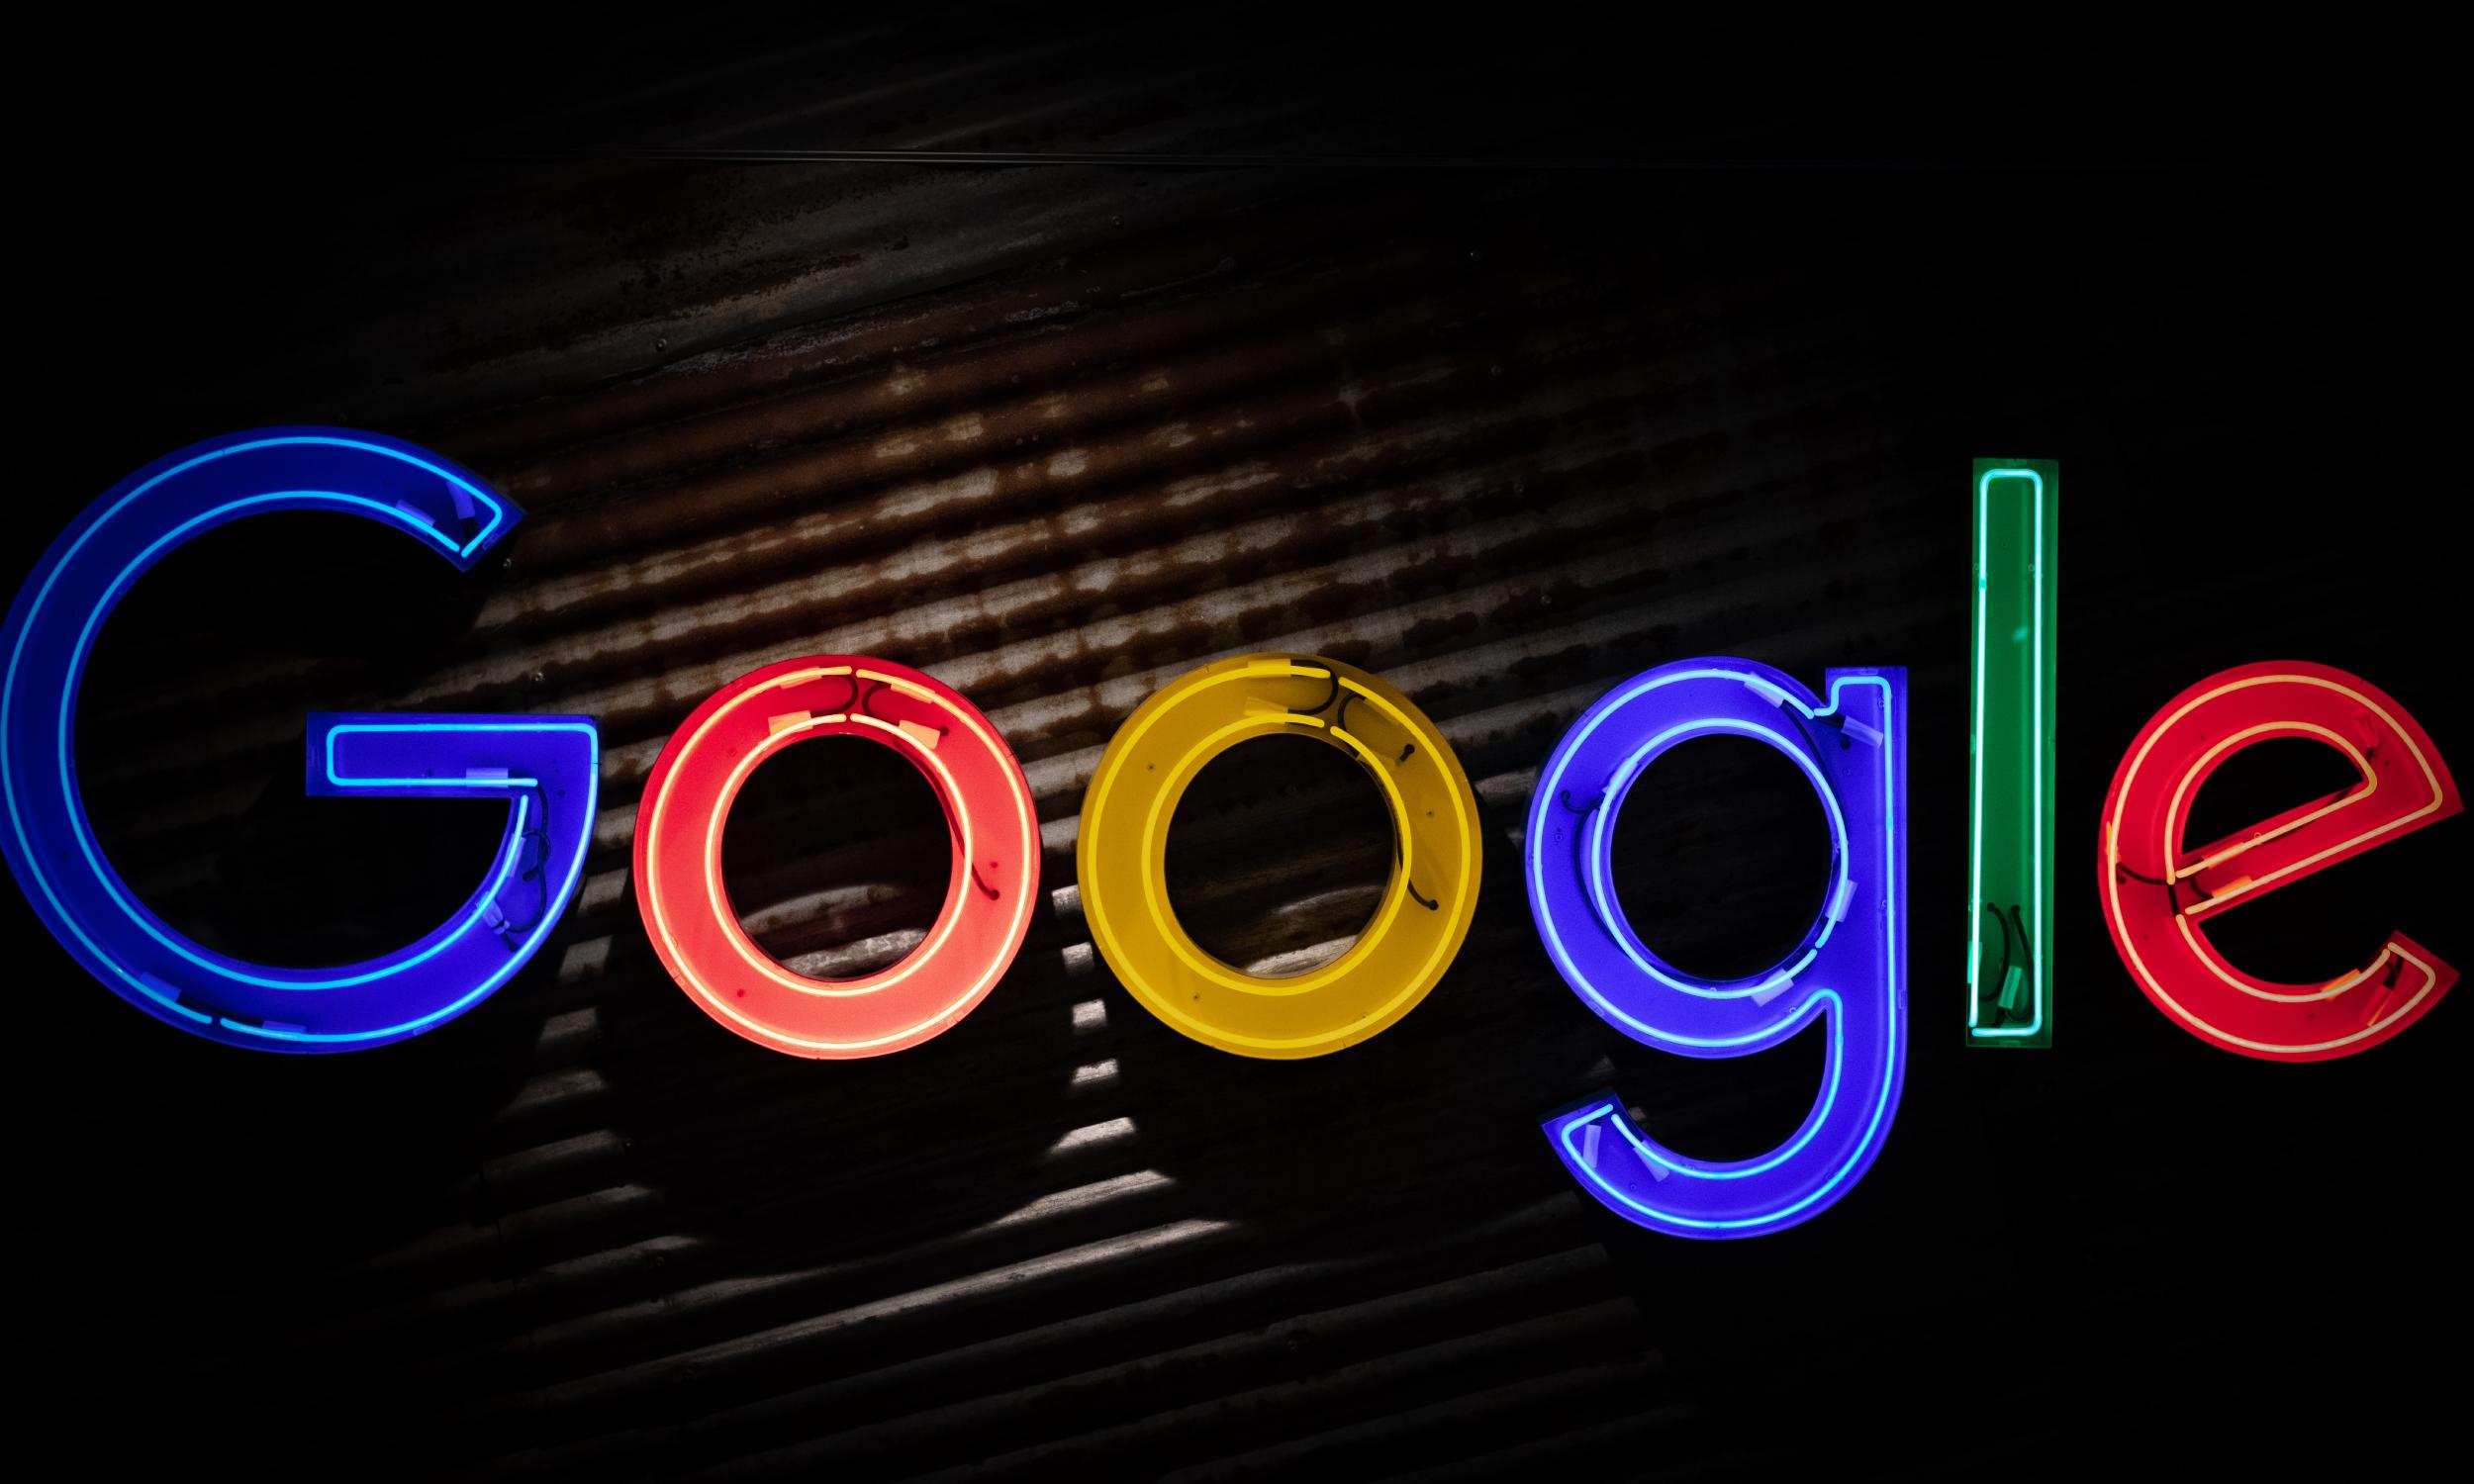 Google Shopping Kampagnen keyword-orientiert aussteuern